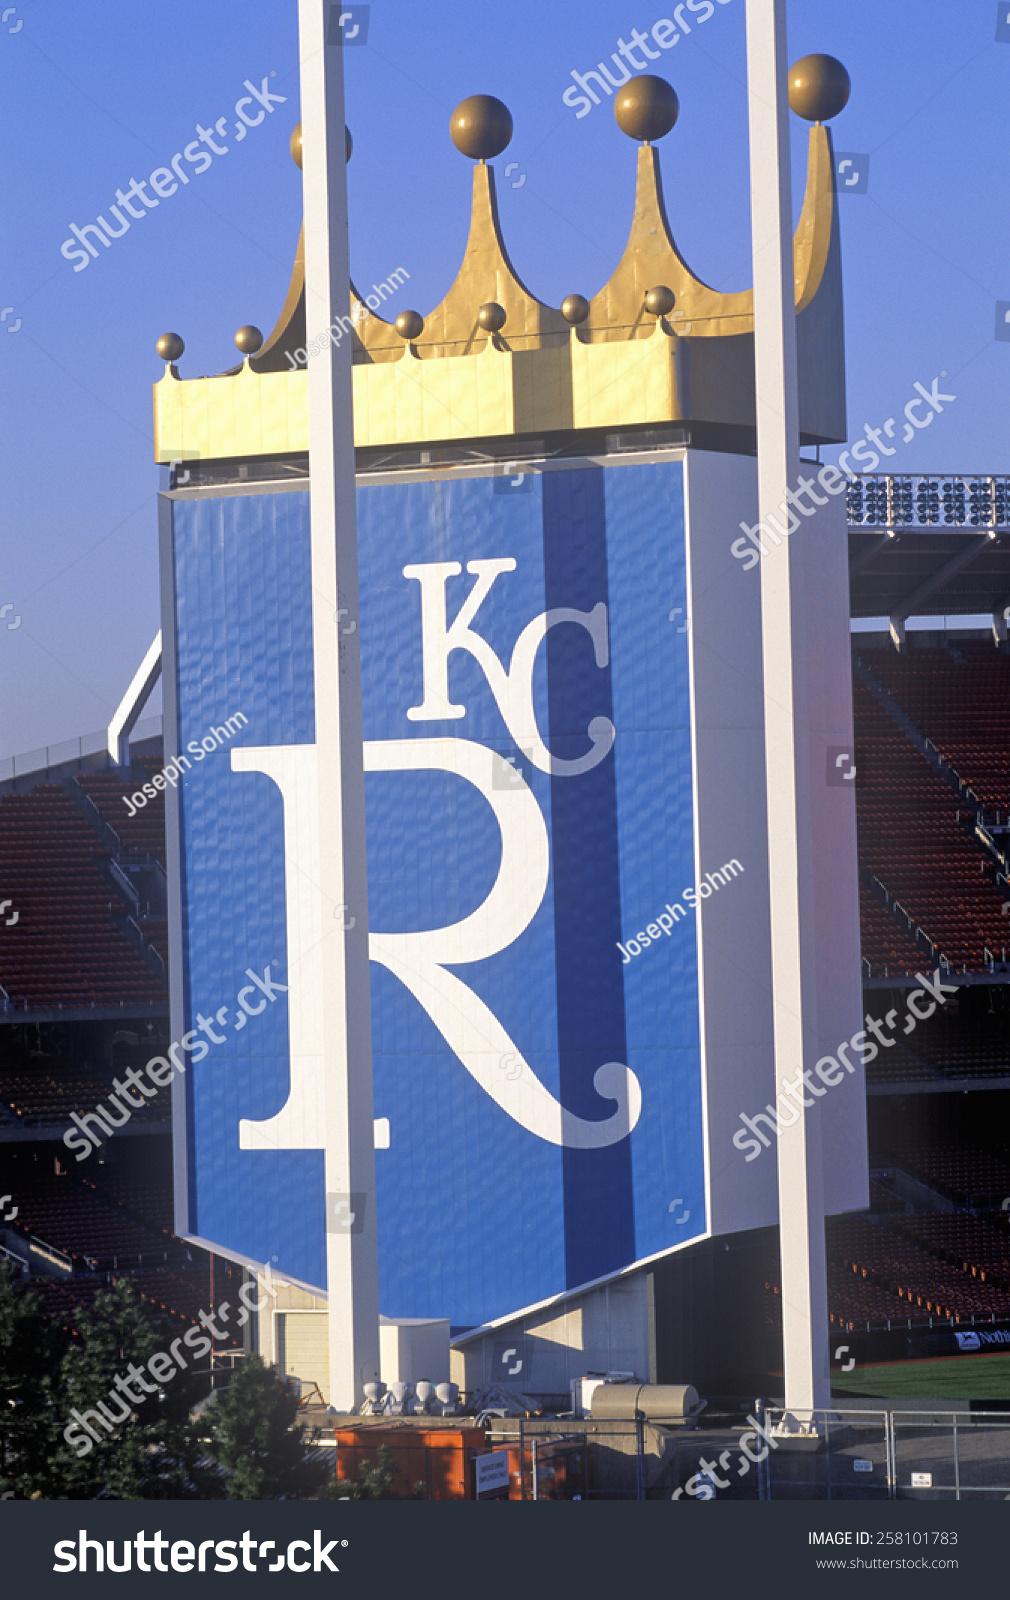 kansas city royals baseball stadium kansas stock photo 258101783 shutterstock. Black Bedroom Furniture Sets. Home Design Ideas